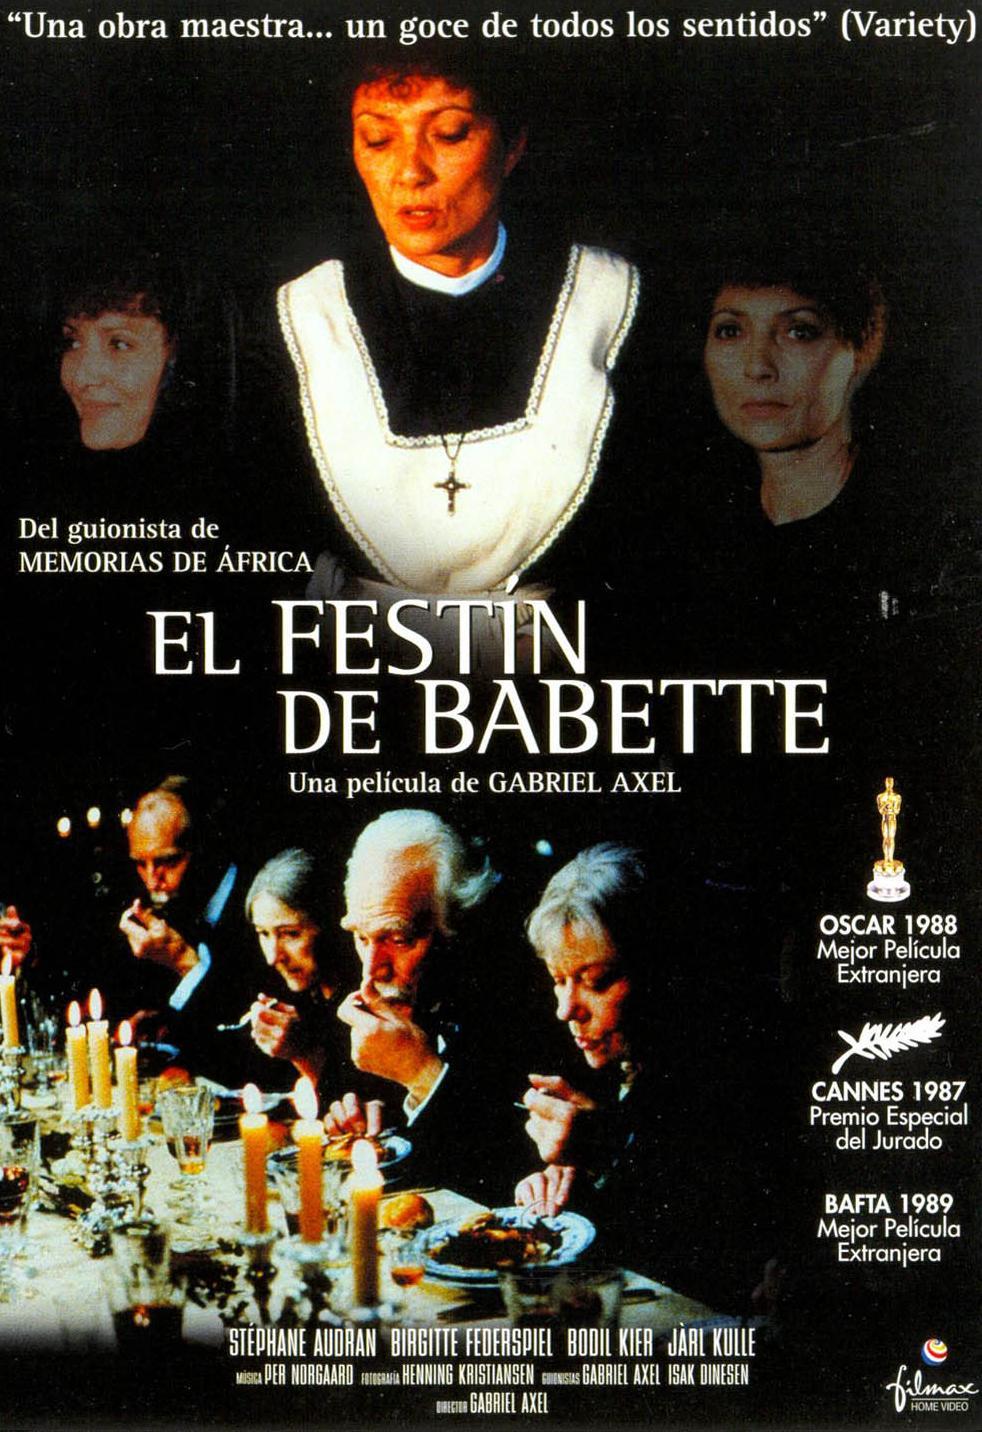 El festin de Babette